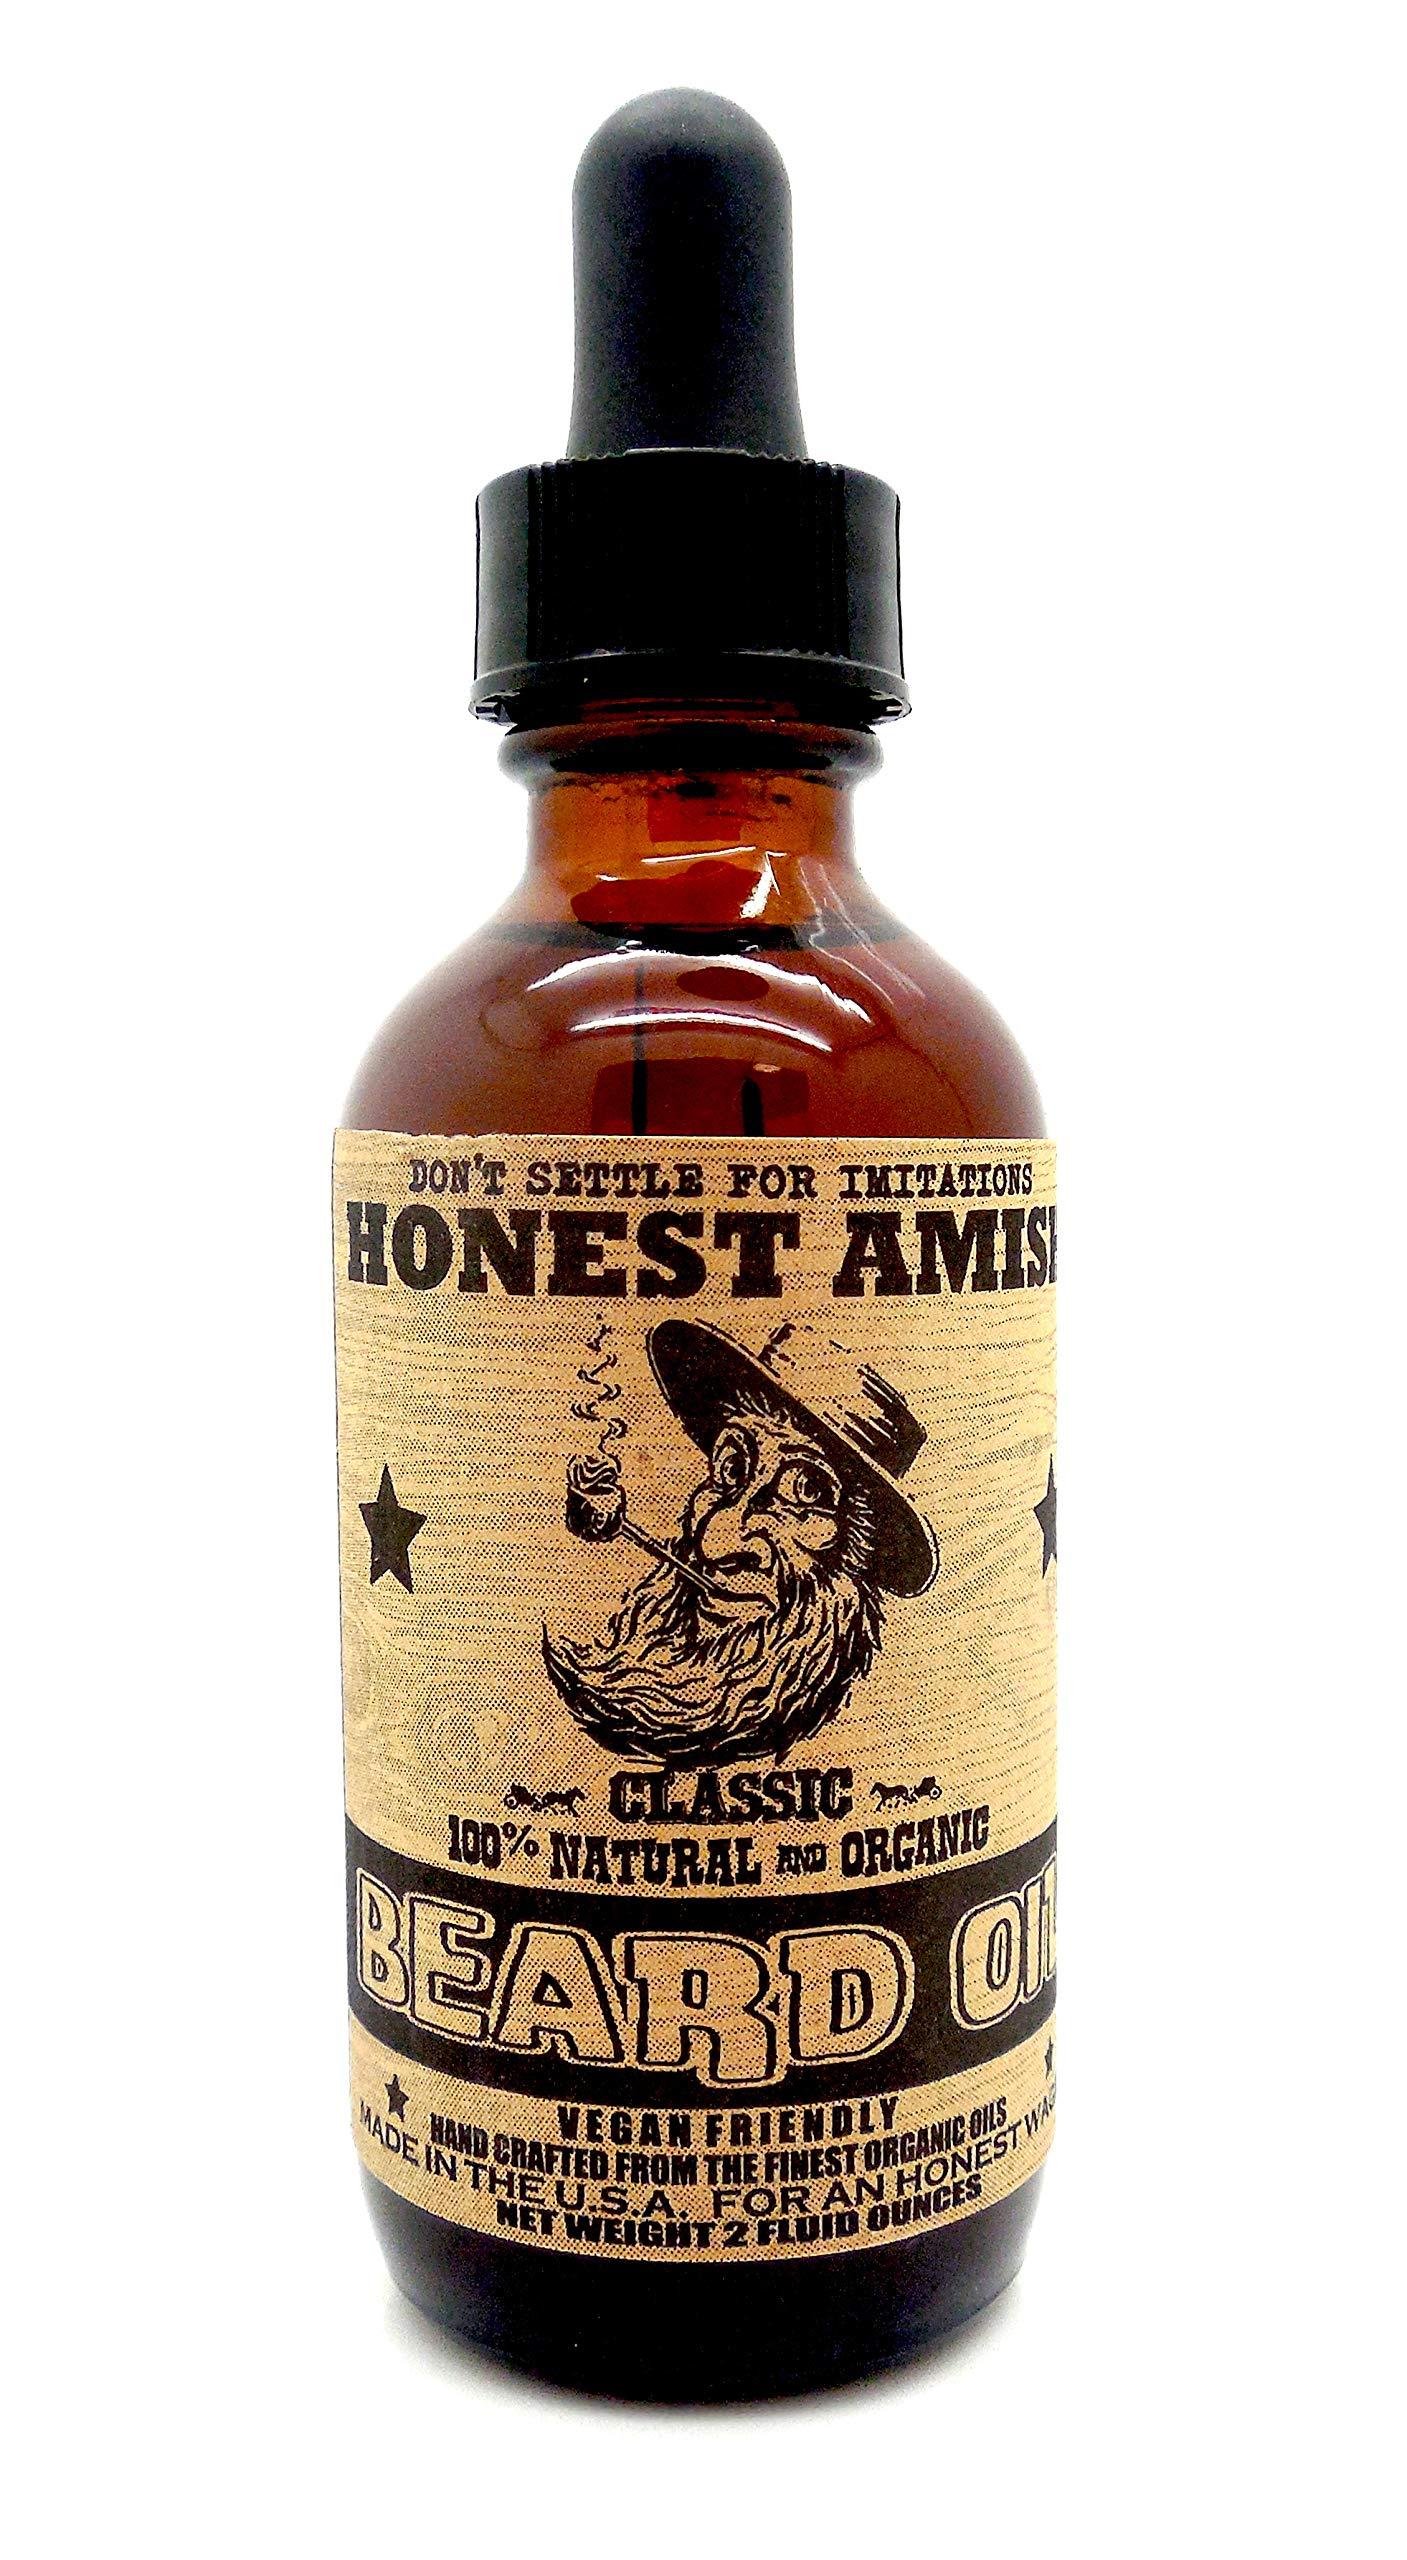 Honest Amish - Classic Beard Oil - 2 Ounce by Honest Amish